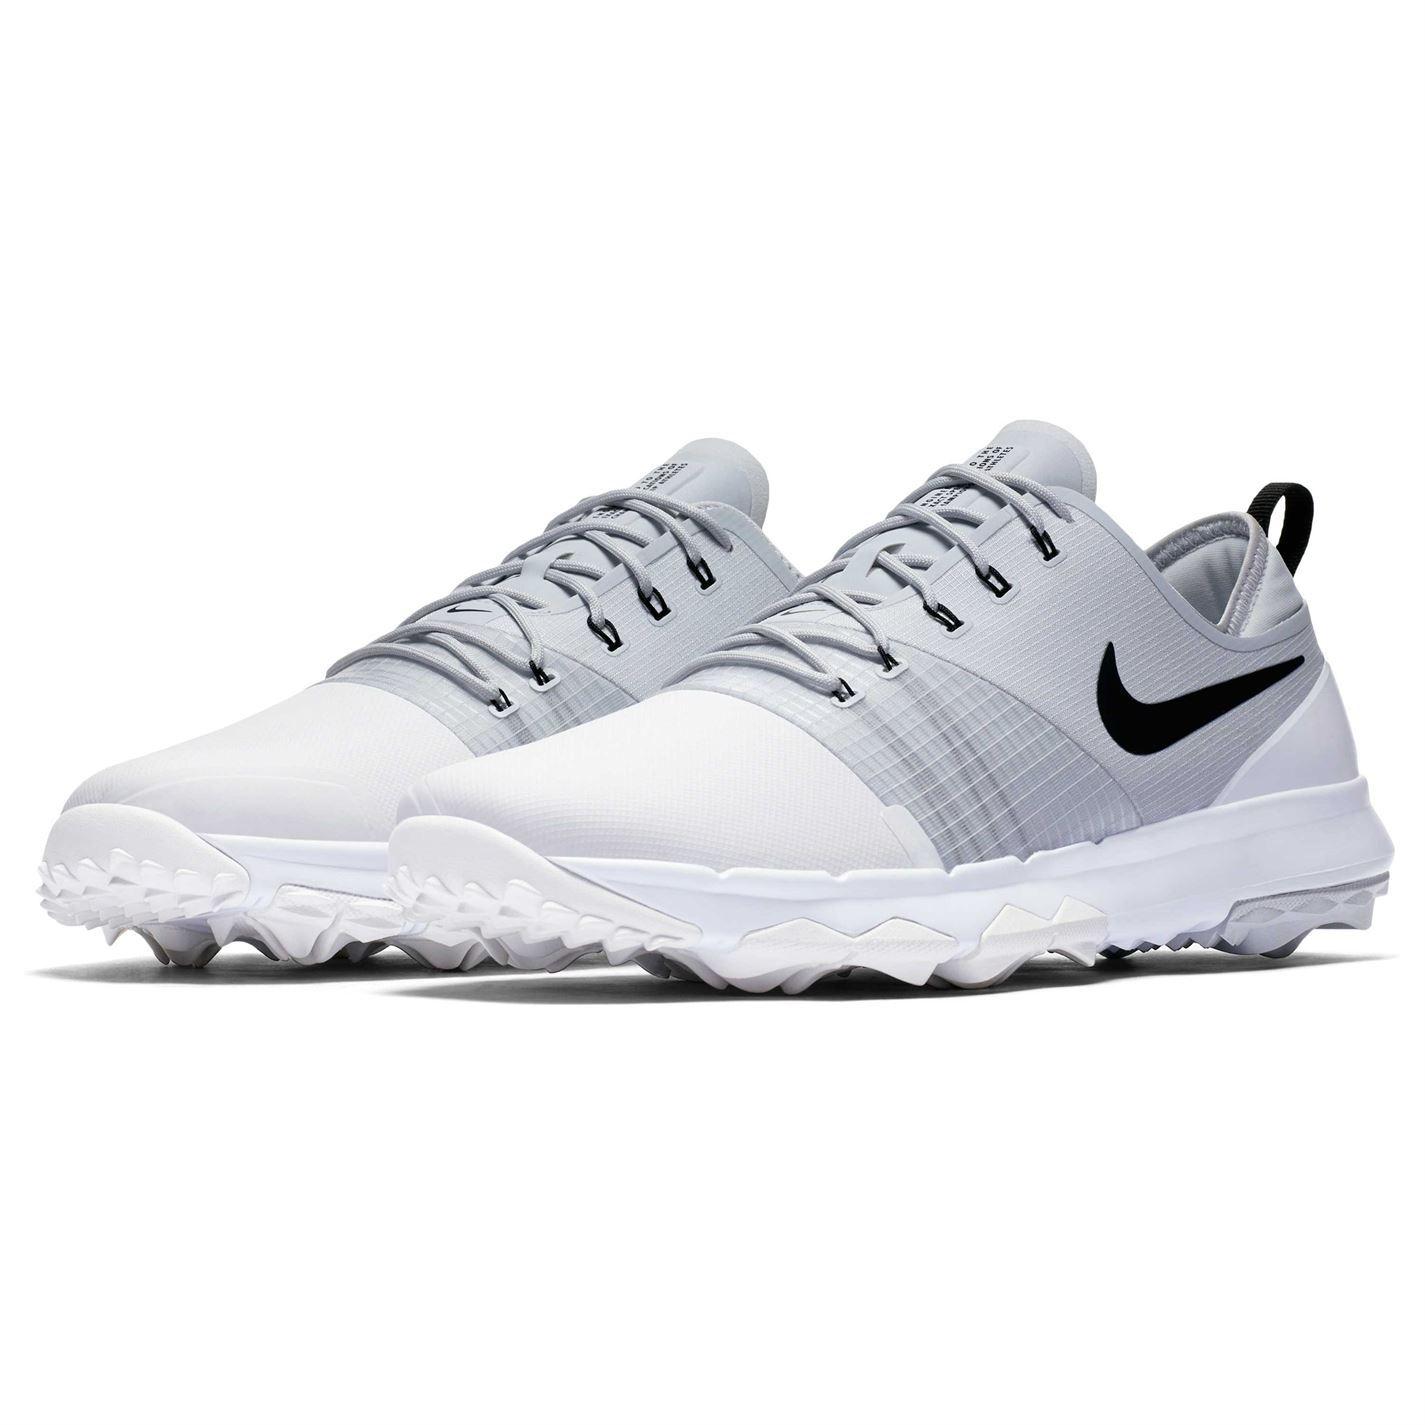 bb91f645de48 Nike-Fi-Impact-Golf-Shoes-Mens-Spikeless-Footwear thumbnail